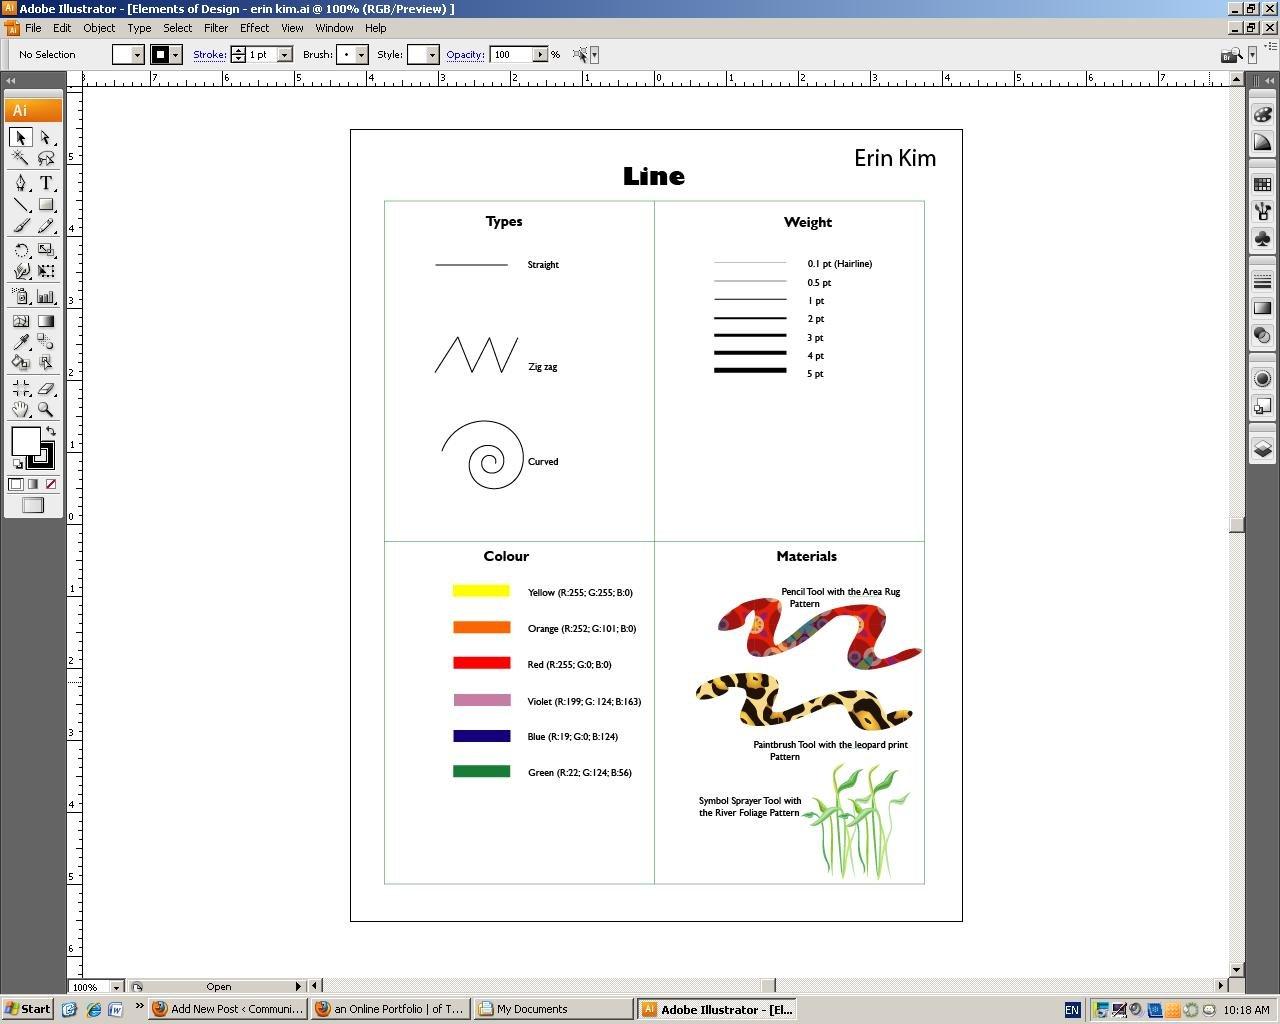 Adobe Illustrator Worksheets